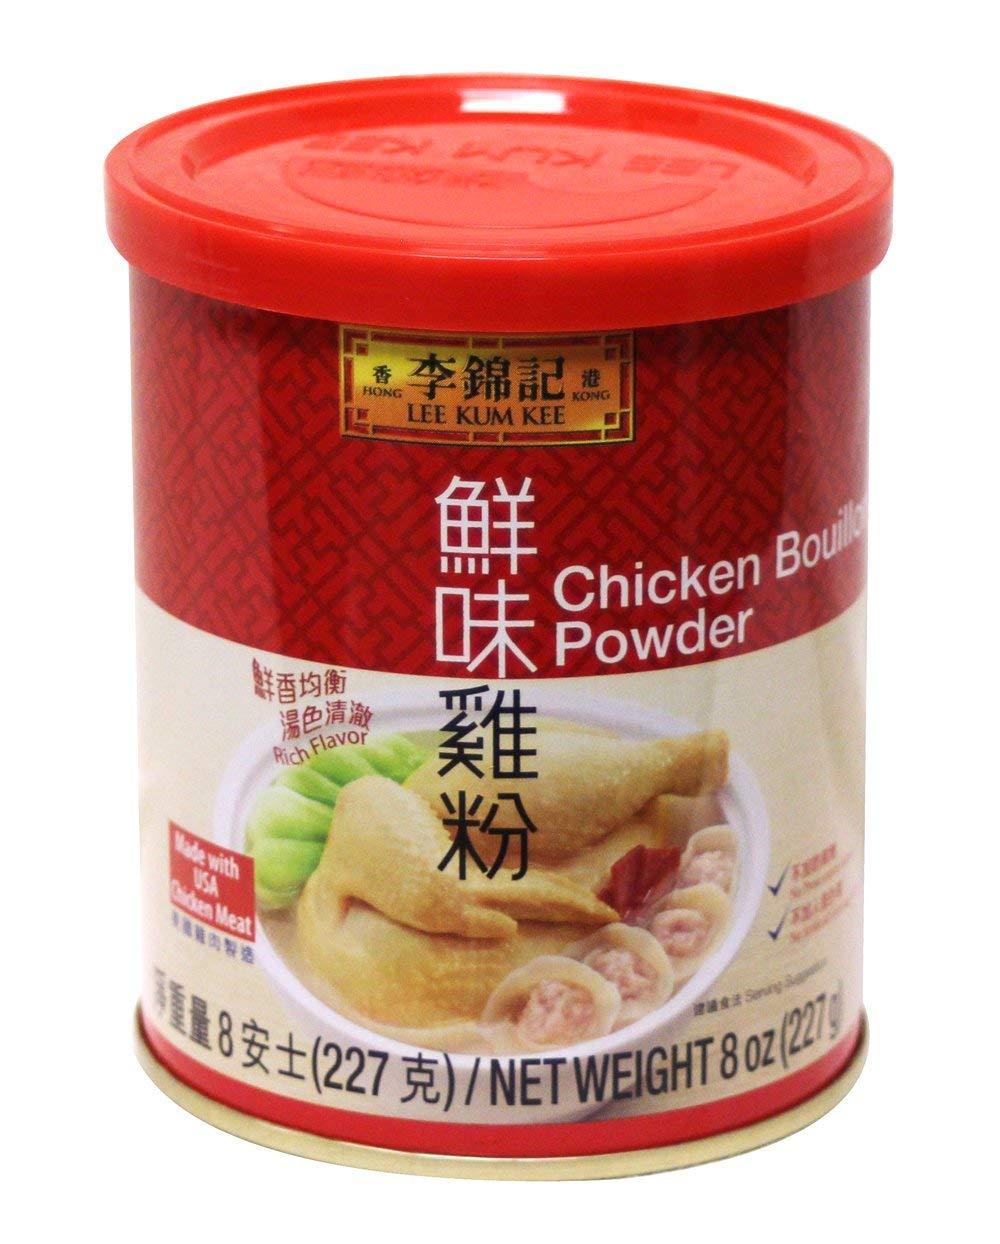 Superior Lee Kum Kee Chicken Bouillon - oz. OF Powder 8 Max 81% OFF SET 1